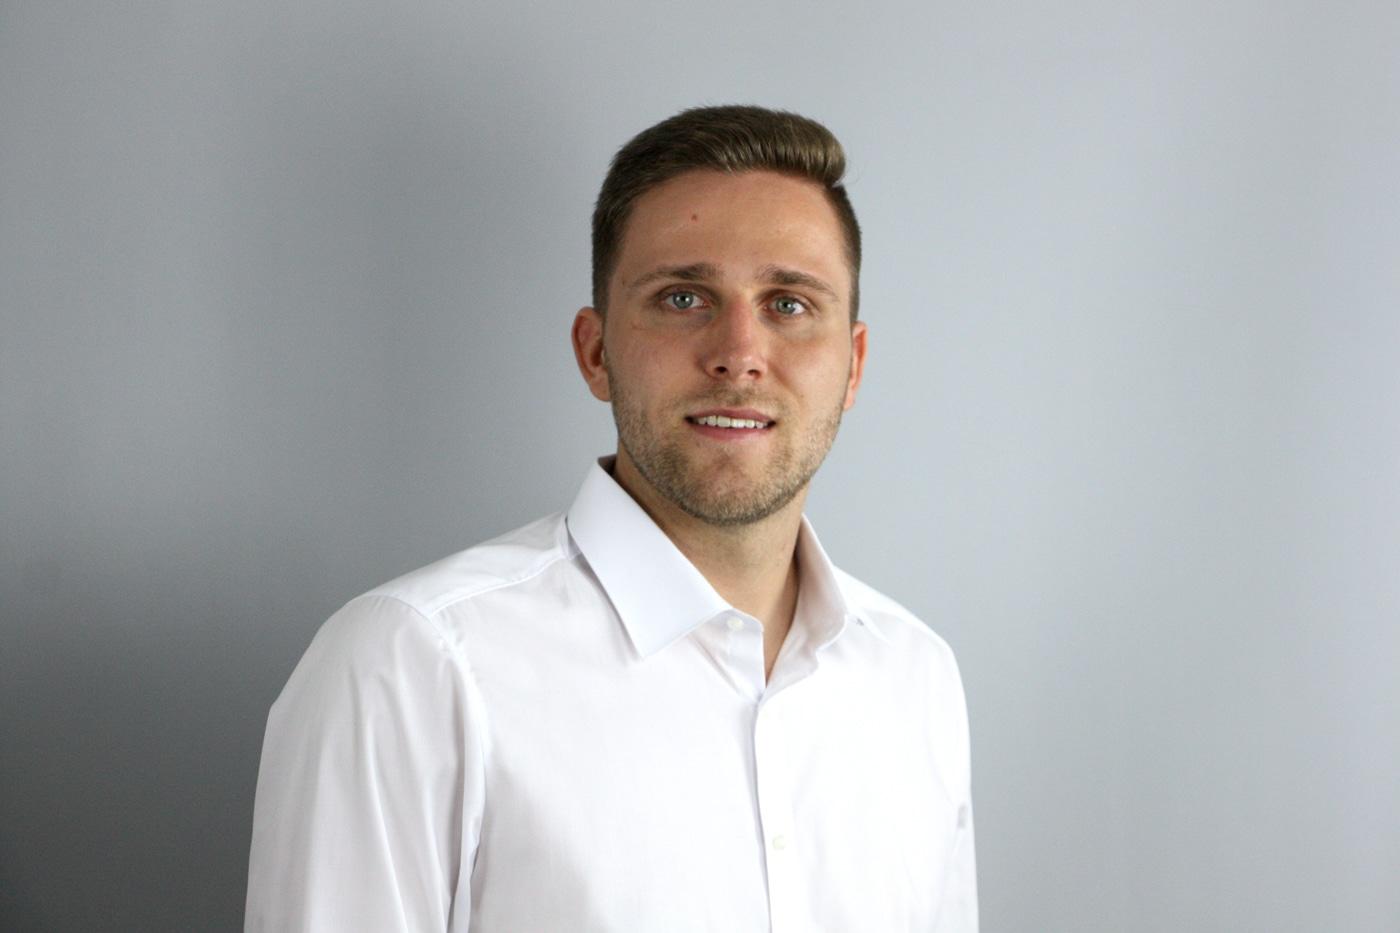 Chris-Laurin Rössler